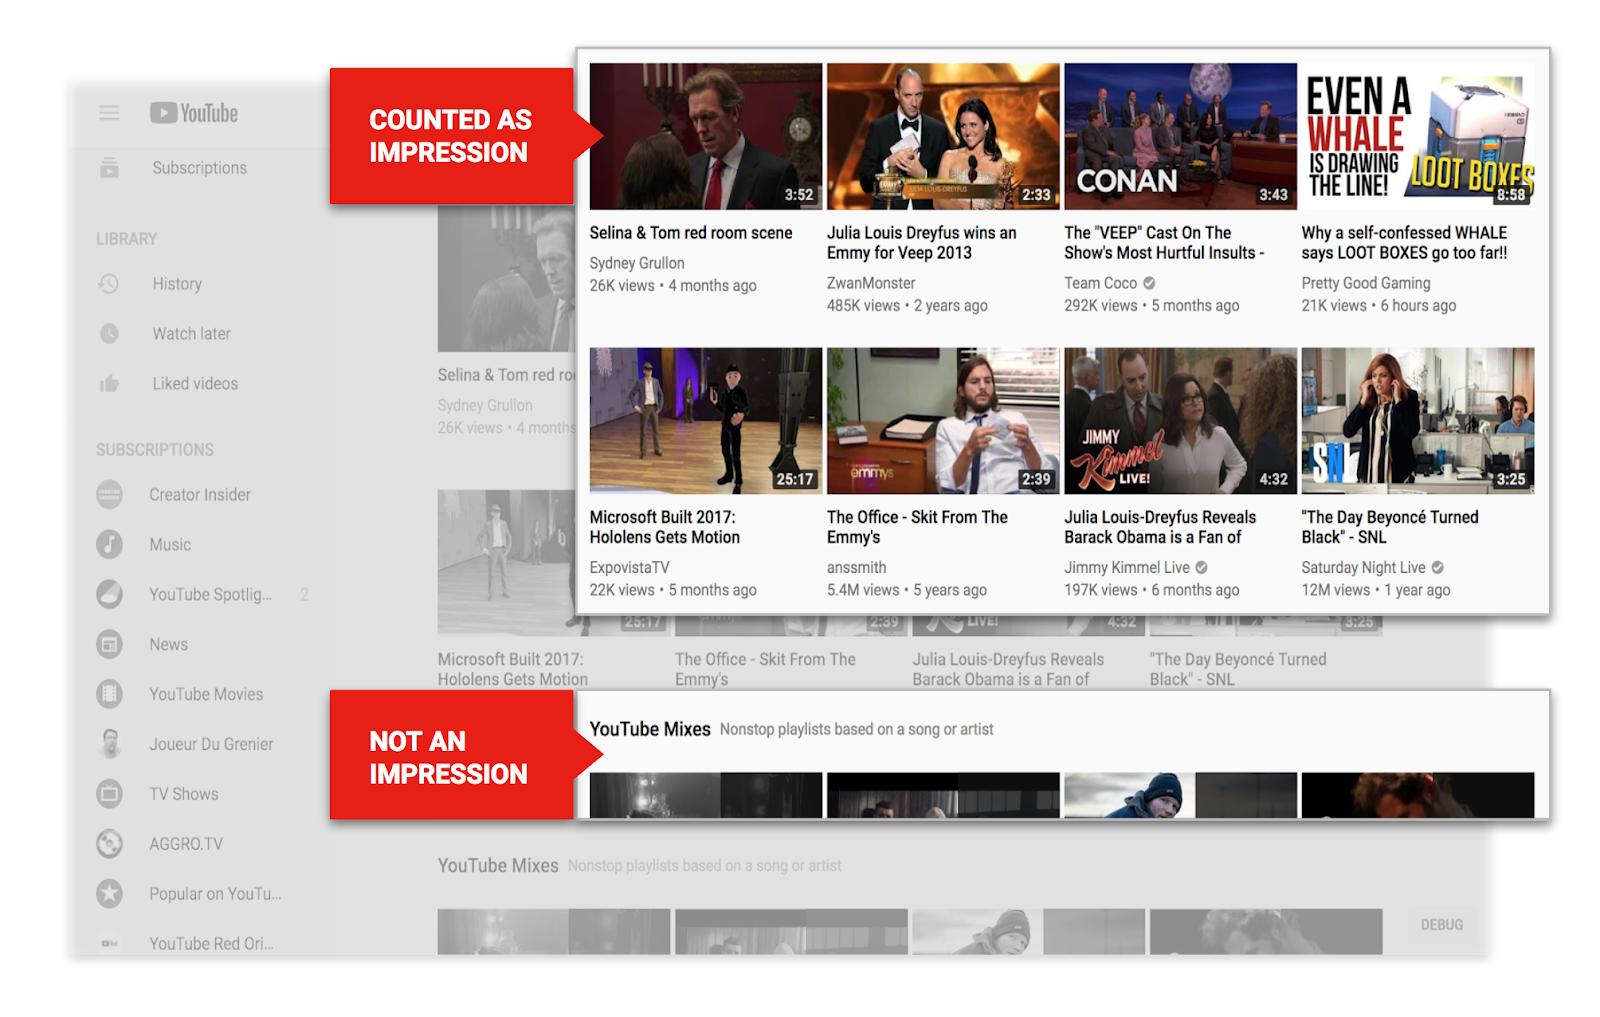 Youtube studio impressions 2